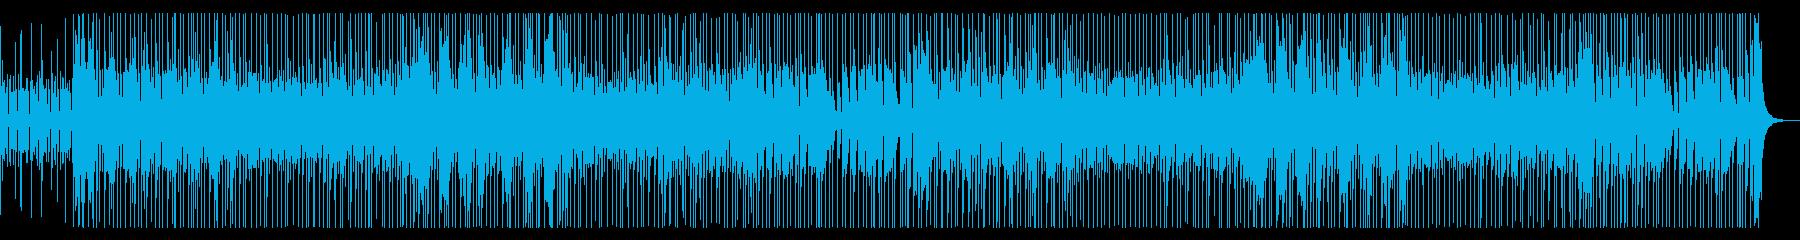 SaguriSaguriの再生済みの波形